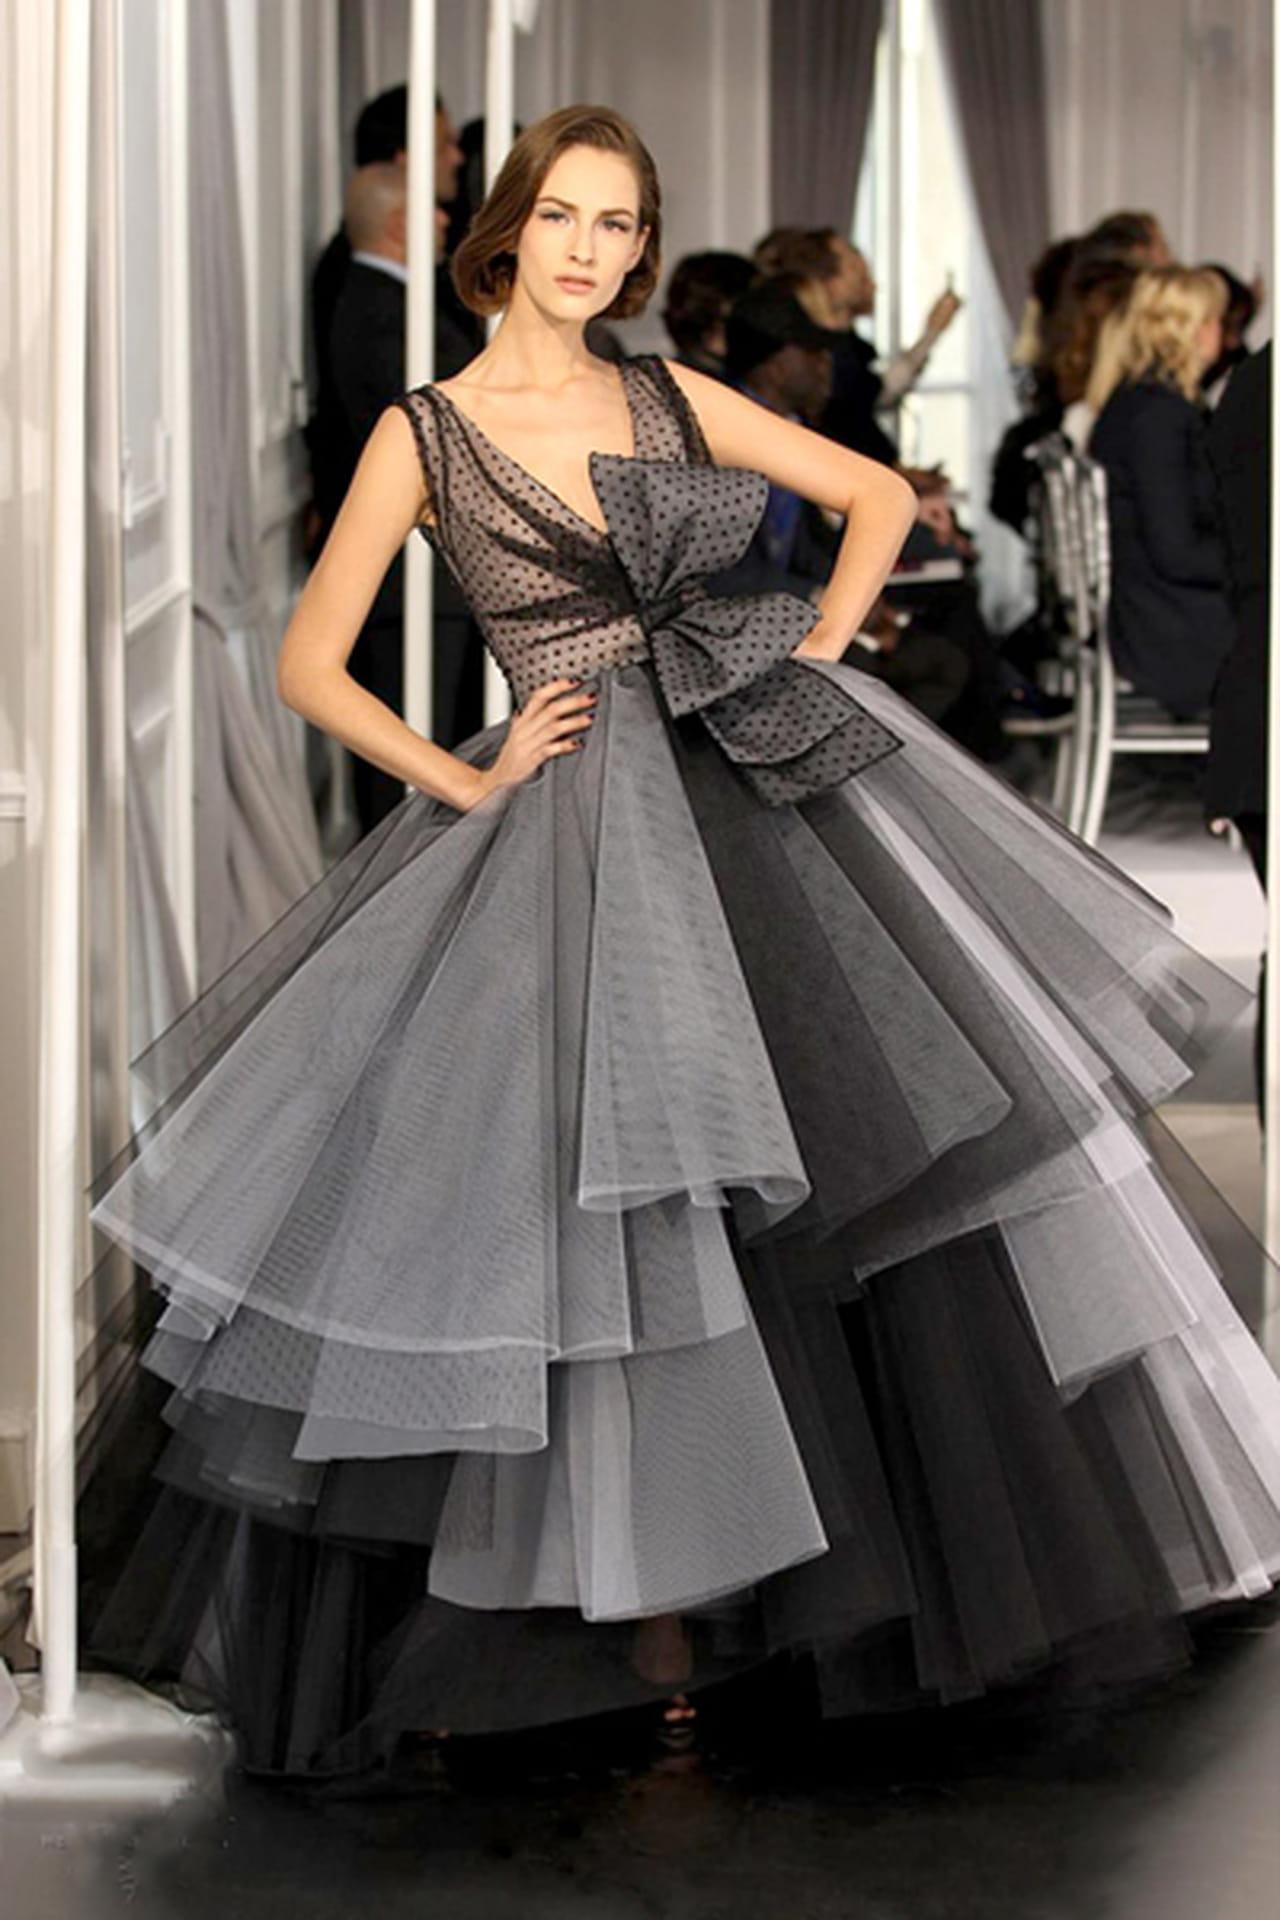 6462b36d2 فستان منفوش بدرجات الأسود والرمادي مزين بفيونكة كبيرة من ديور Dior. الفساتين  ...